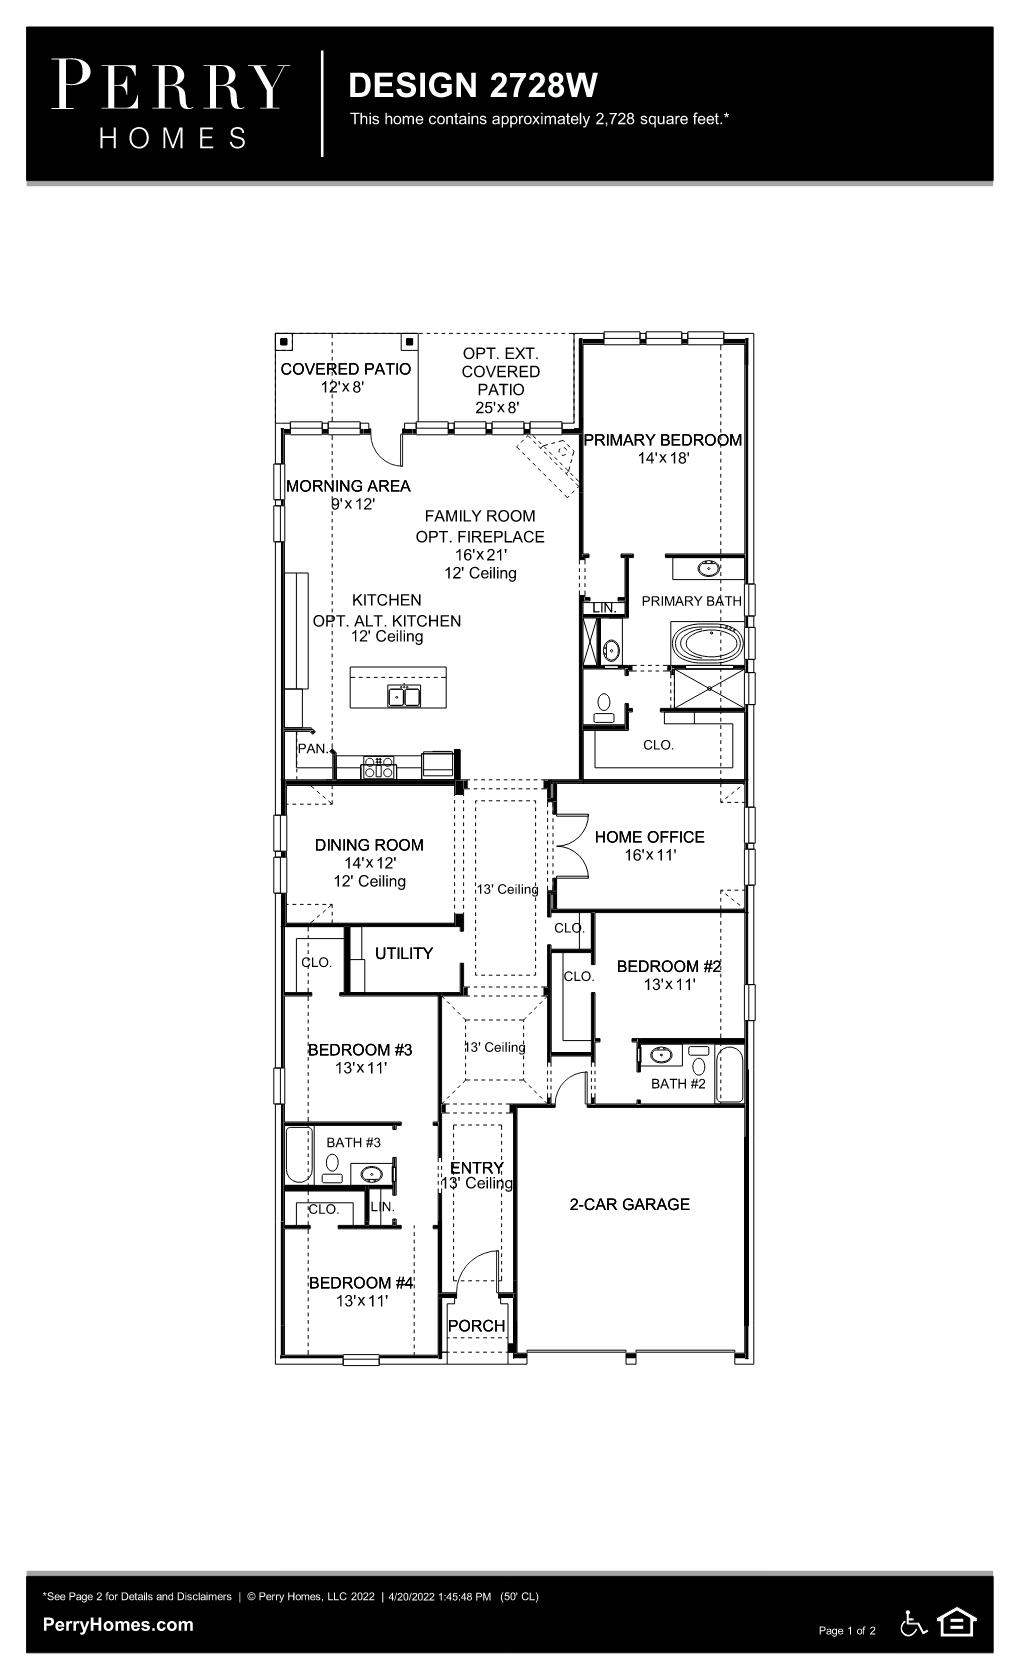 Floor Plan for 2728W